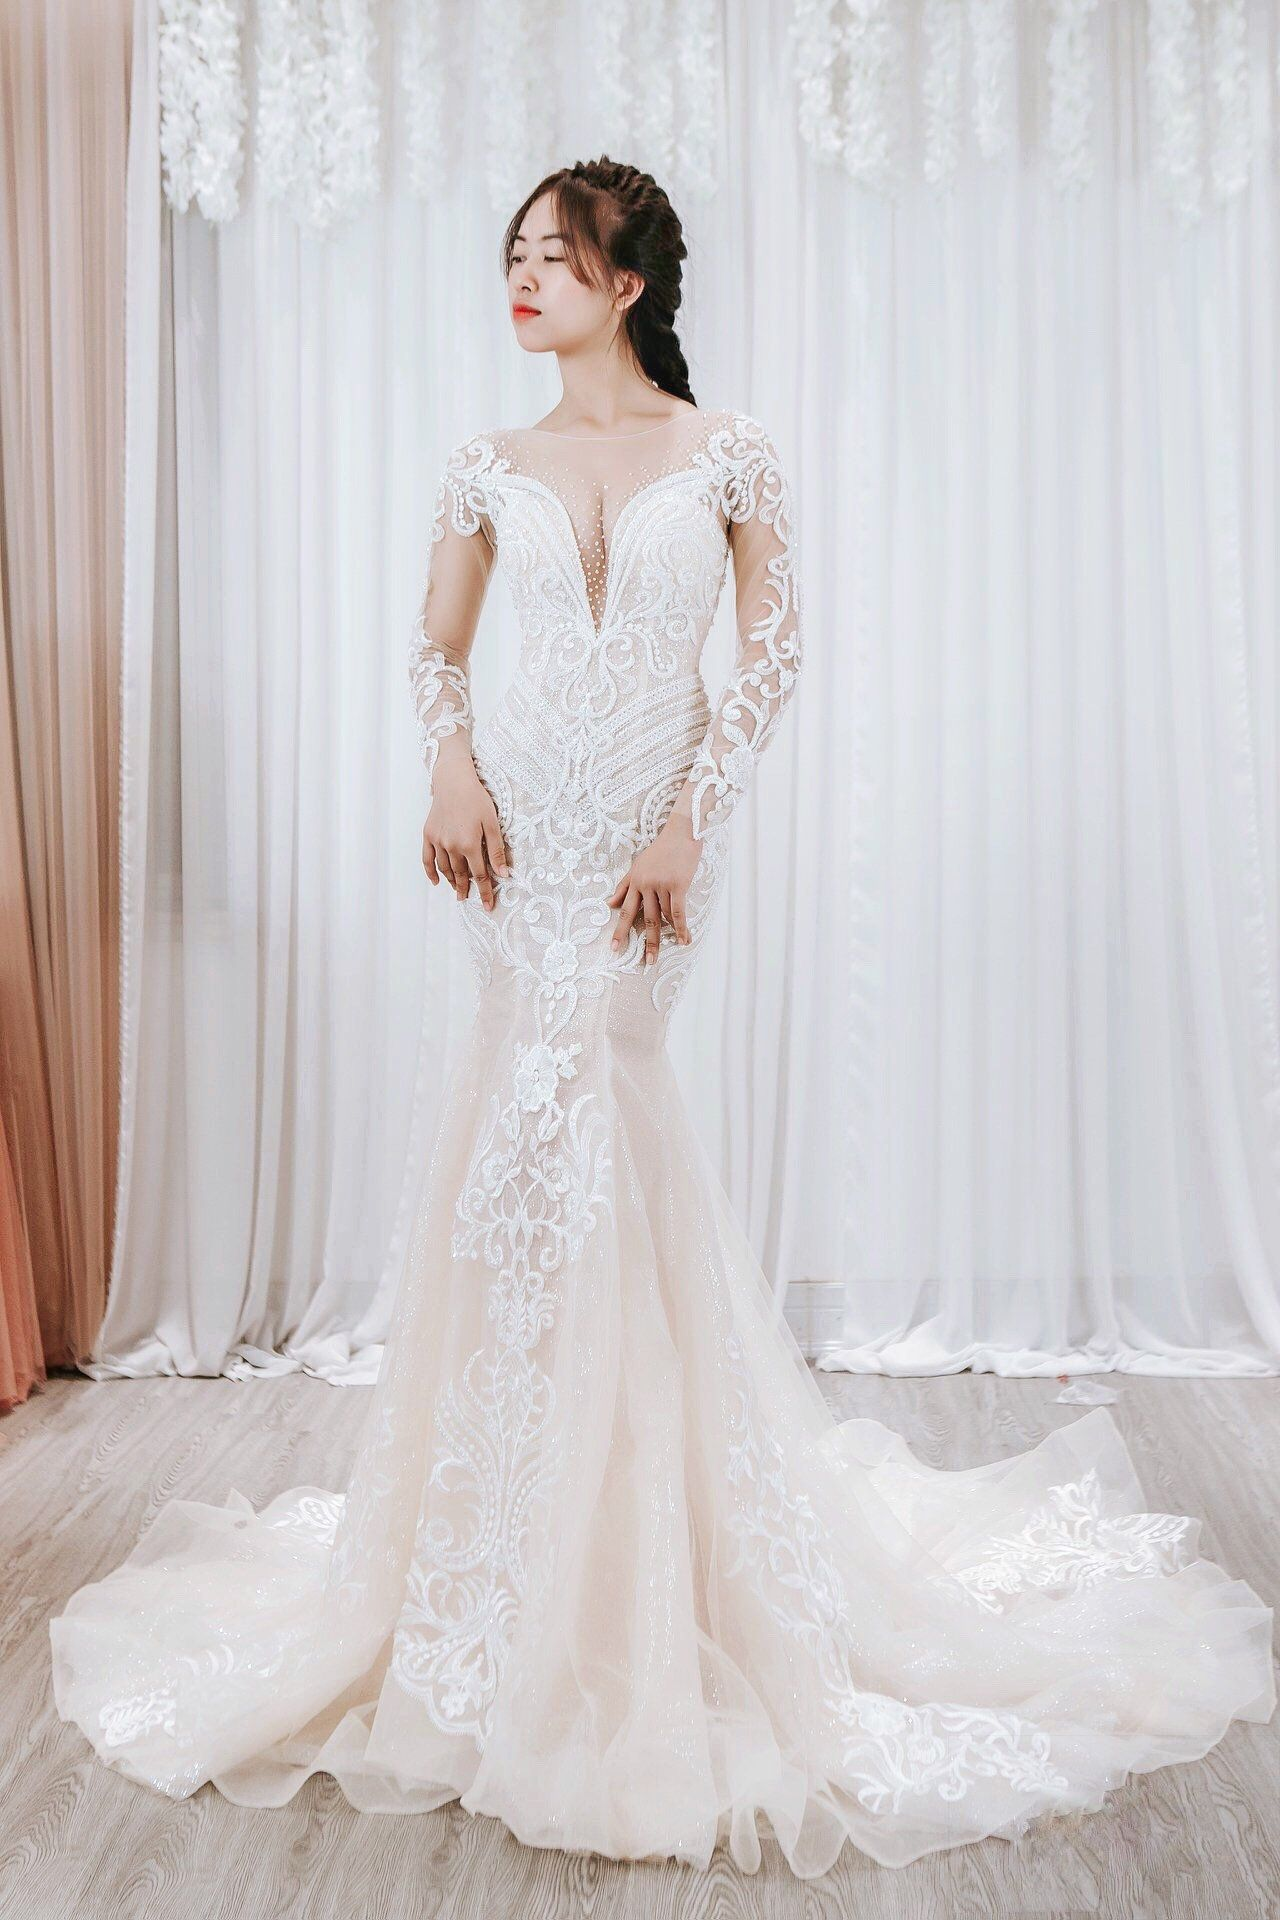 Amelia Mermaid Bridal Gown/ Detachable Overskirt/ Luxury